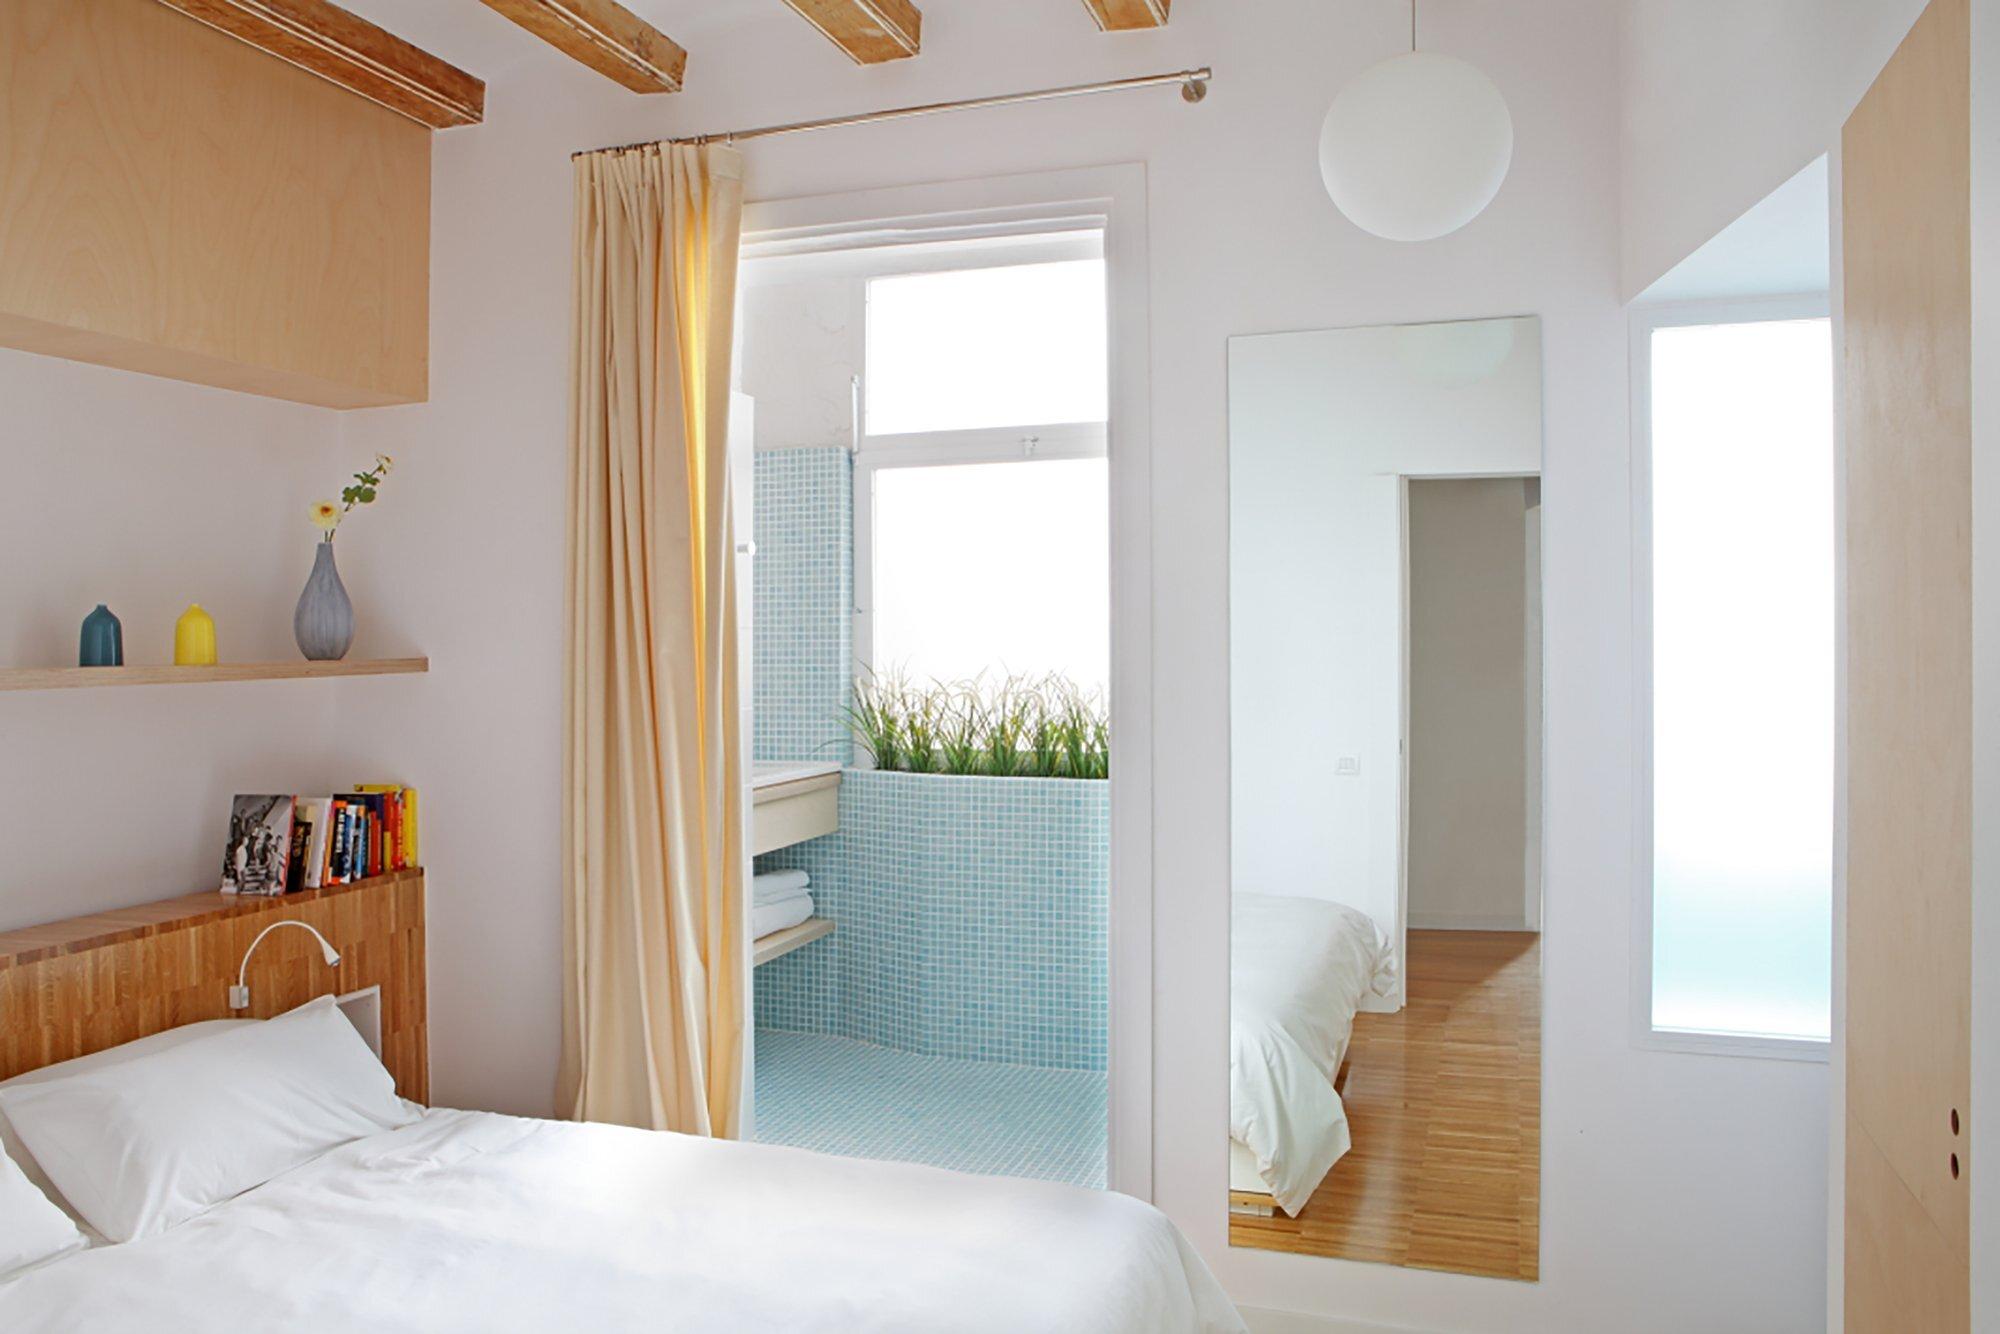 Apartment Pujades11 - Small Apartment - Miel Arquitectos + Studio P10 - Spain - Bedroom - Humble Homes